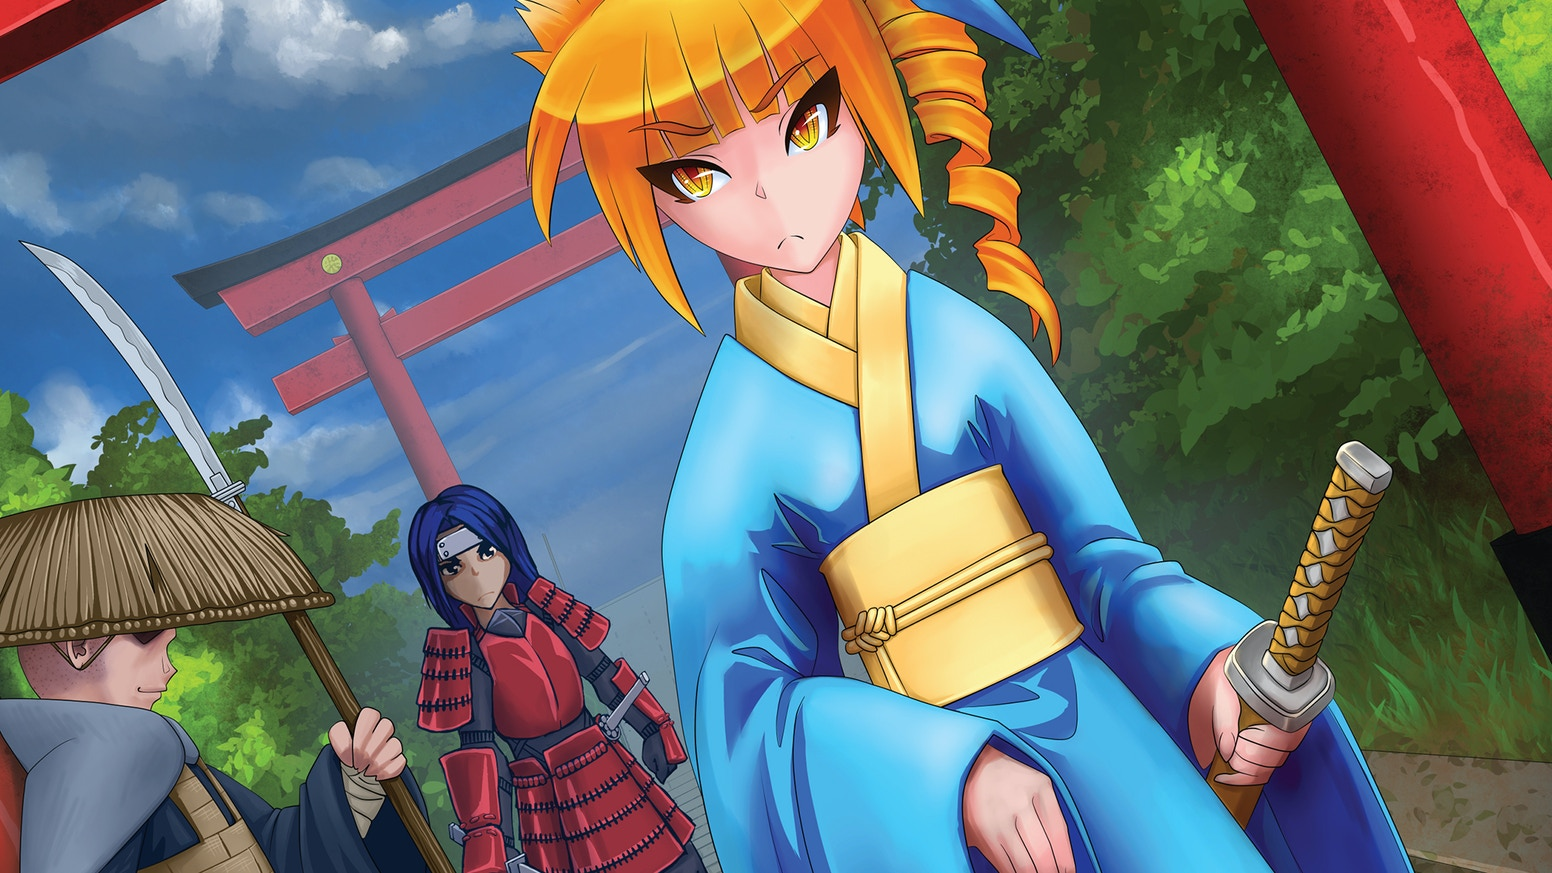 Wa, The Anime & Manga RPG by Joe Bush » Updated Character